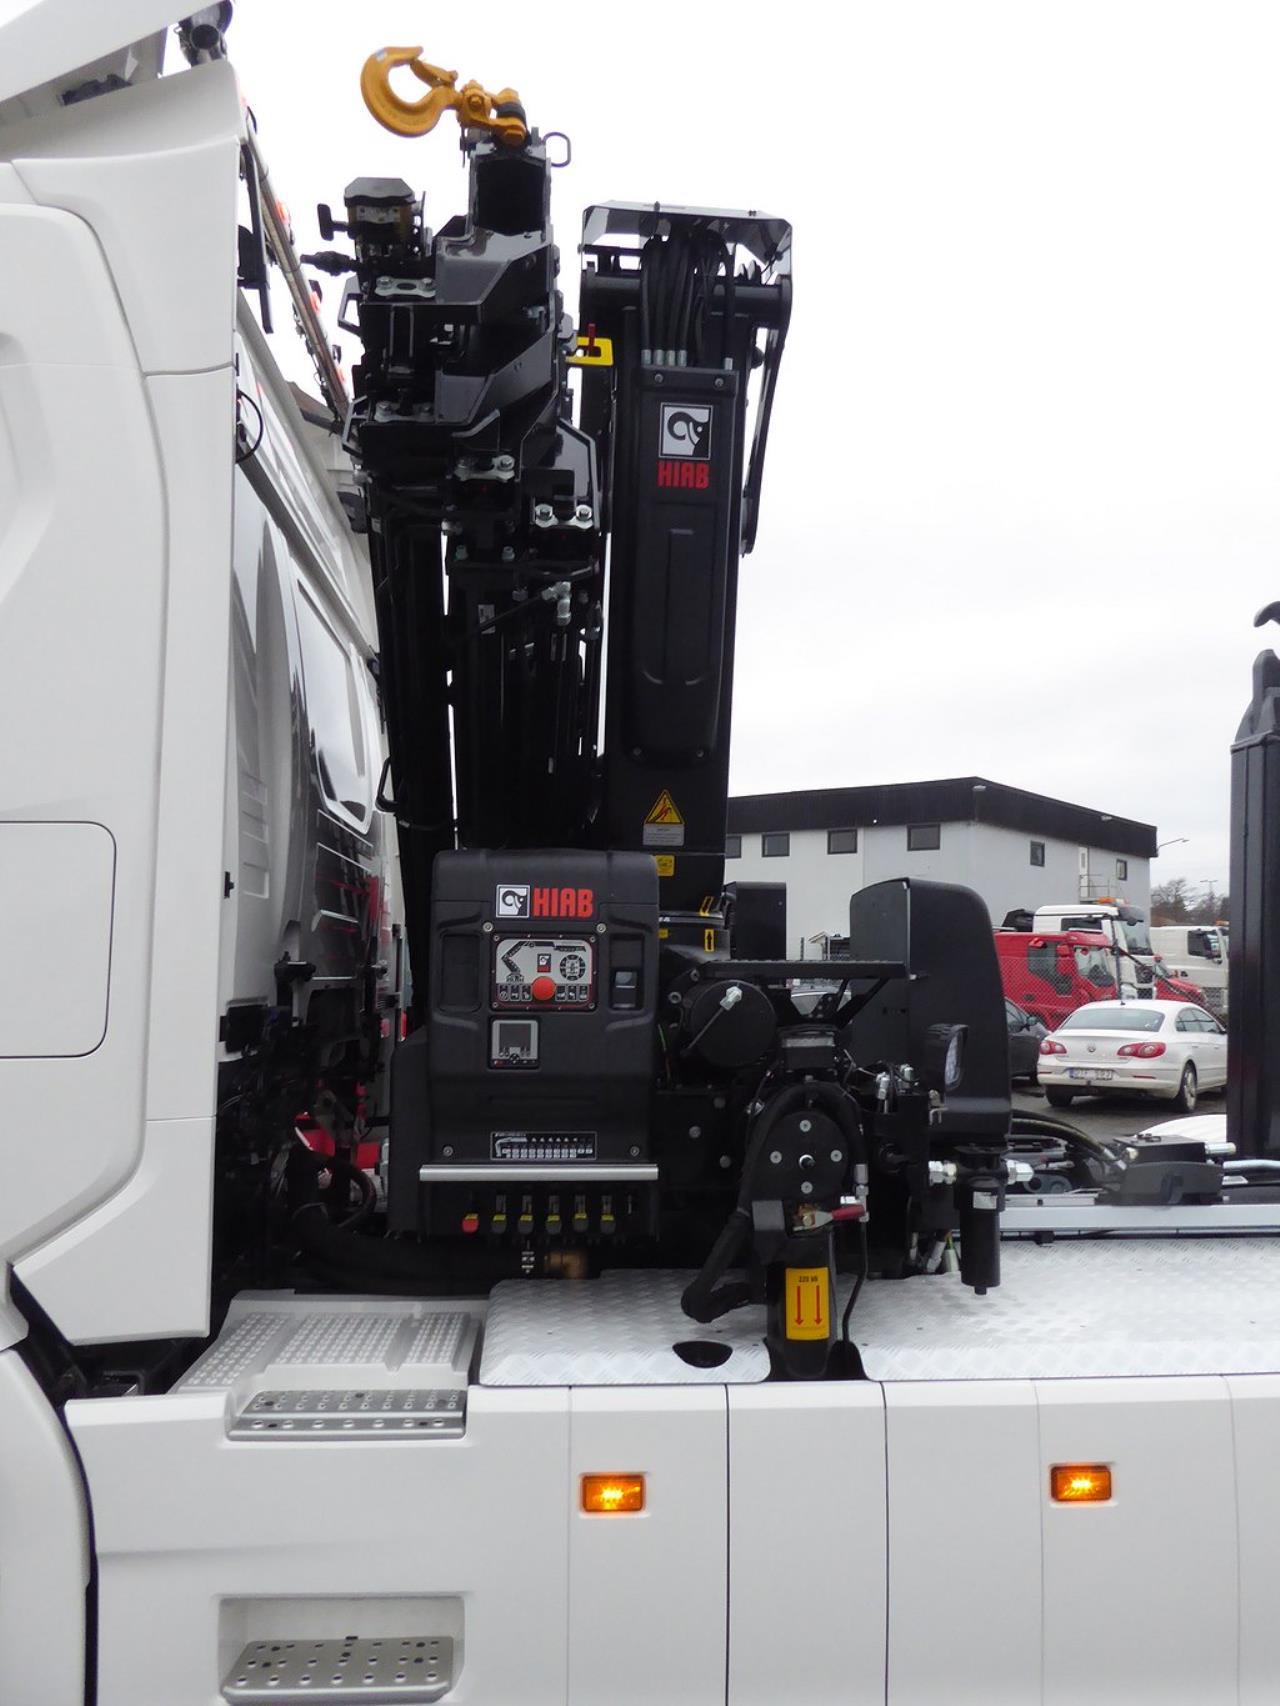 Scania G500 8x4*4 Kranväxlare  2021 - Krok/Lastväxlare